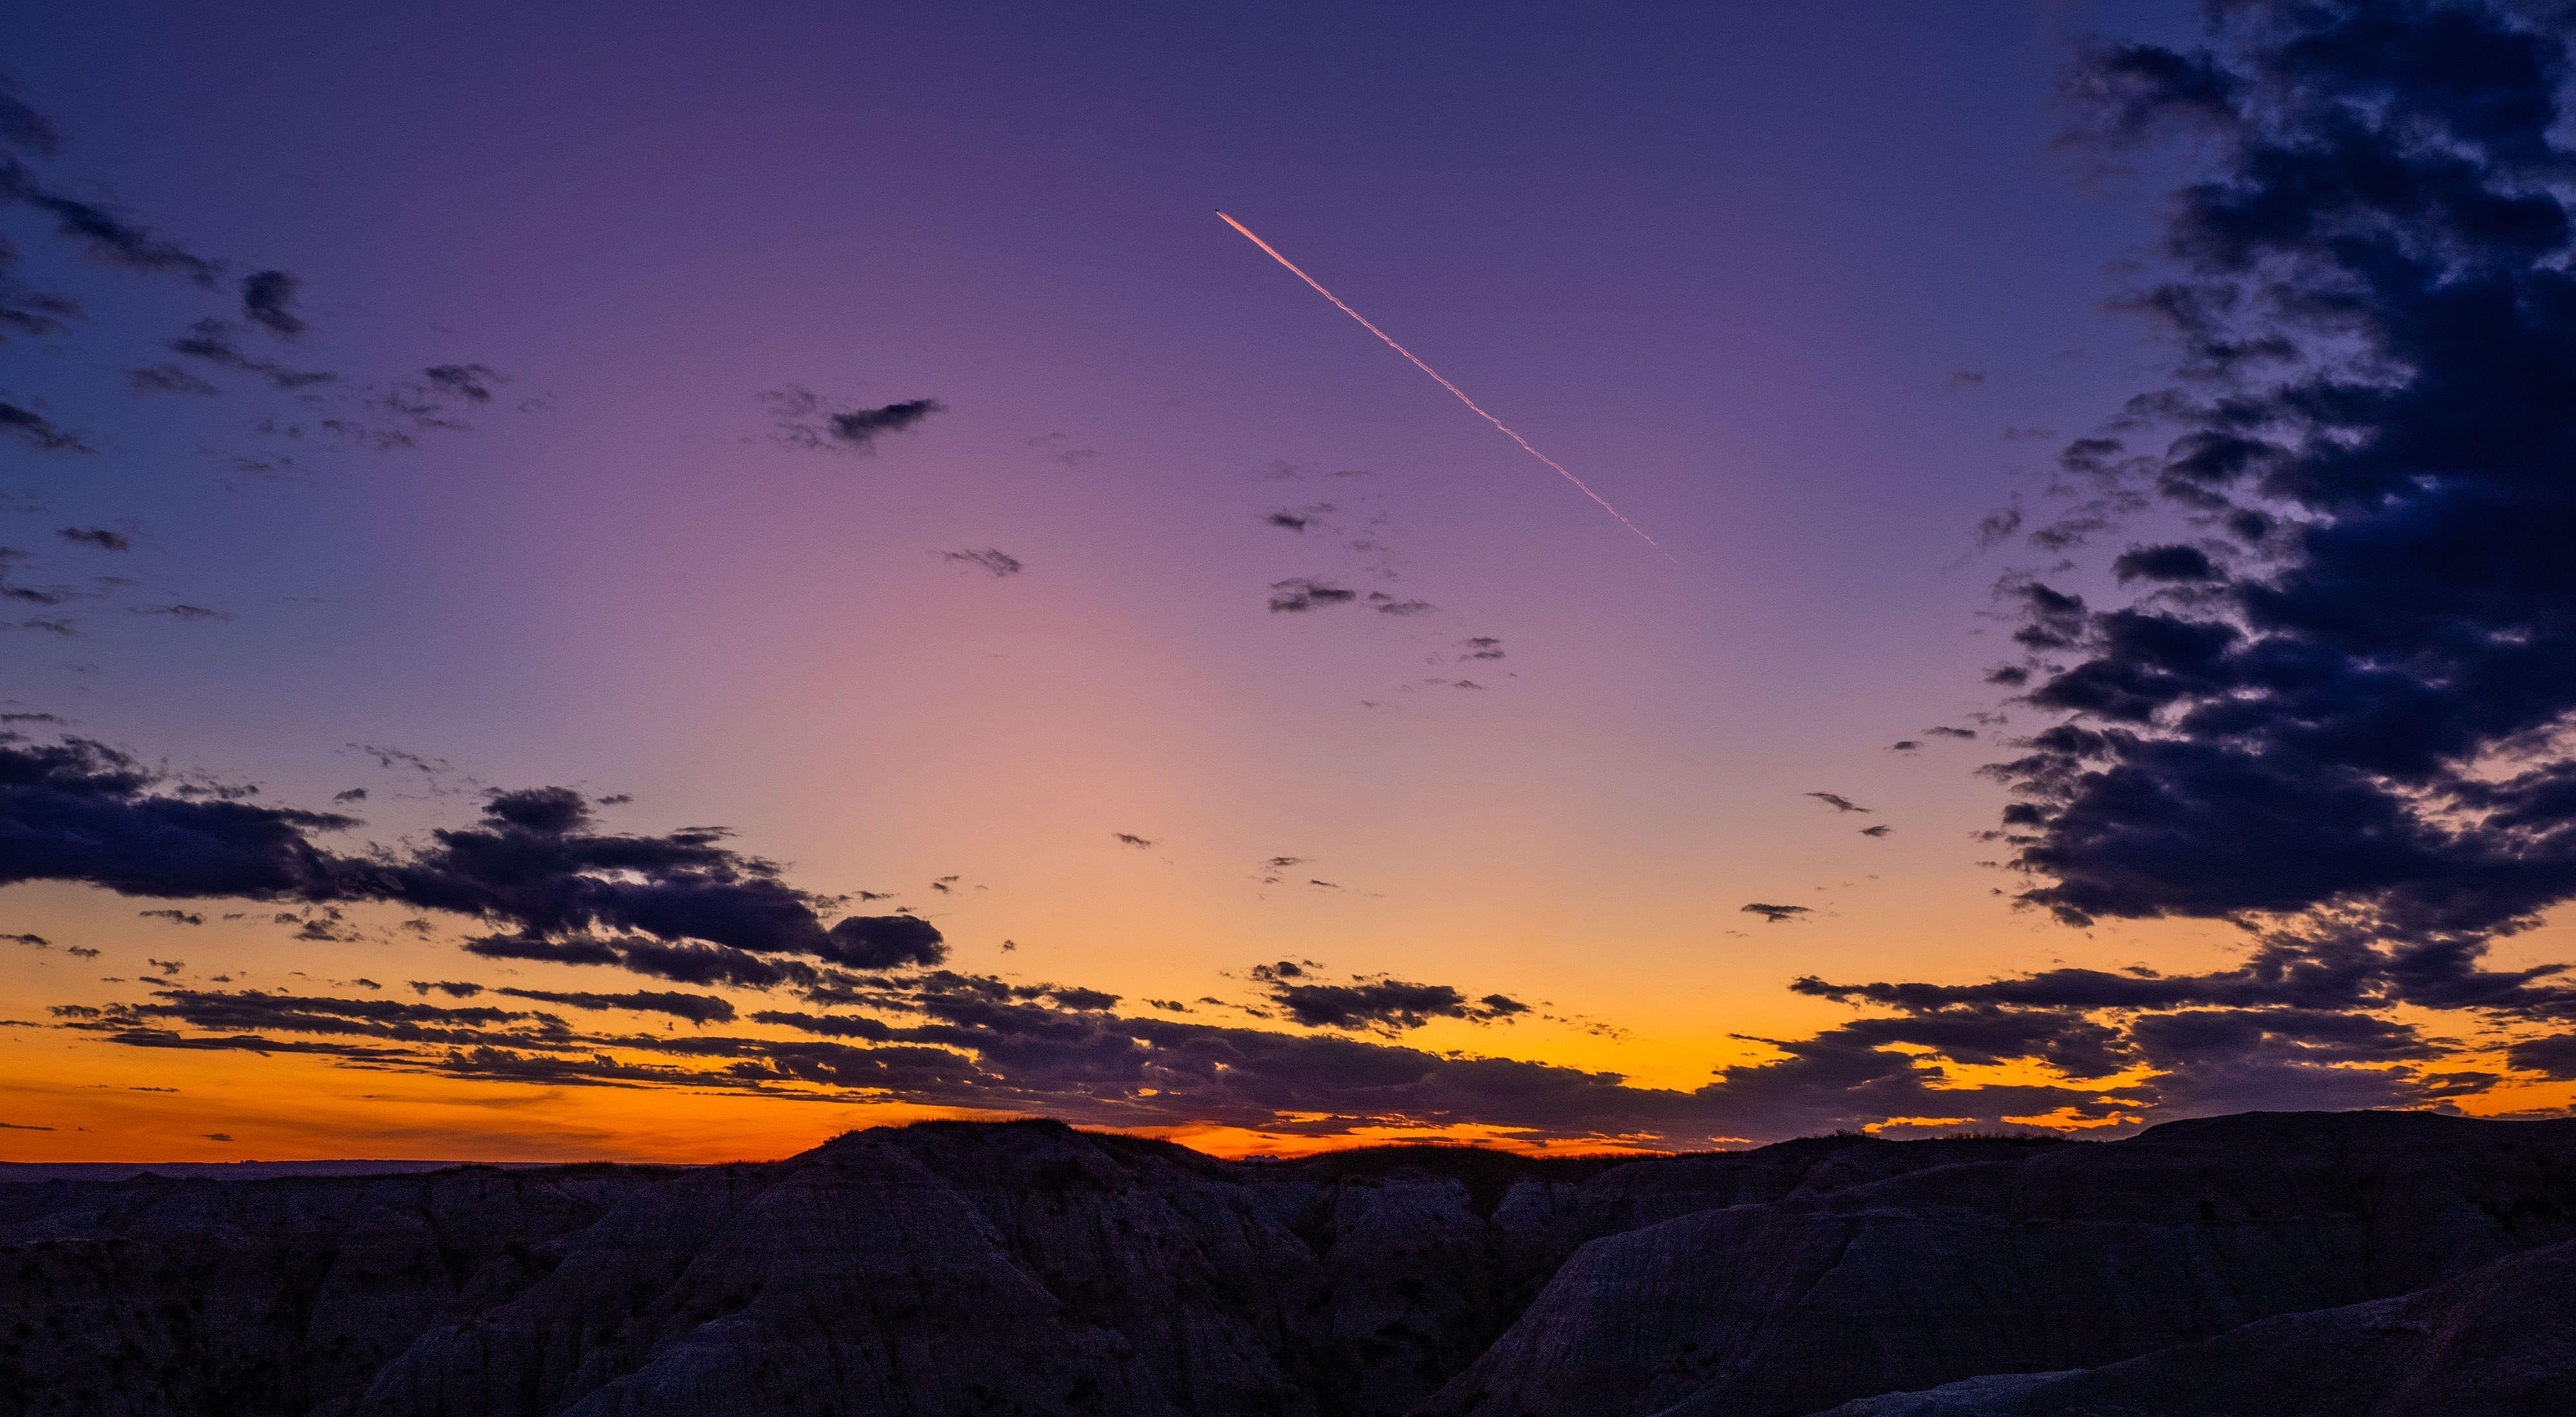 A spectacular orange and purple sunset.